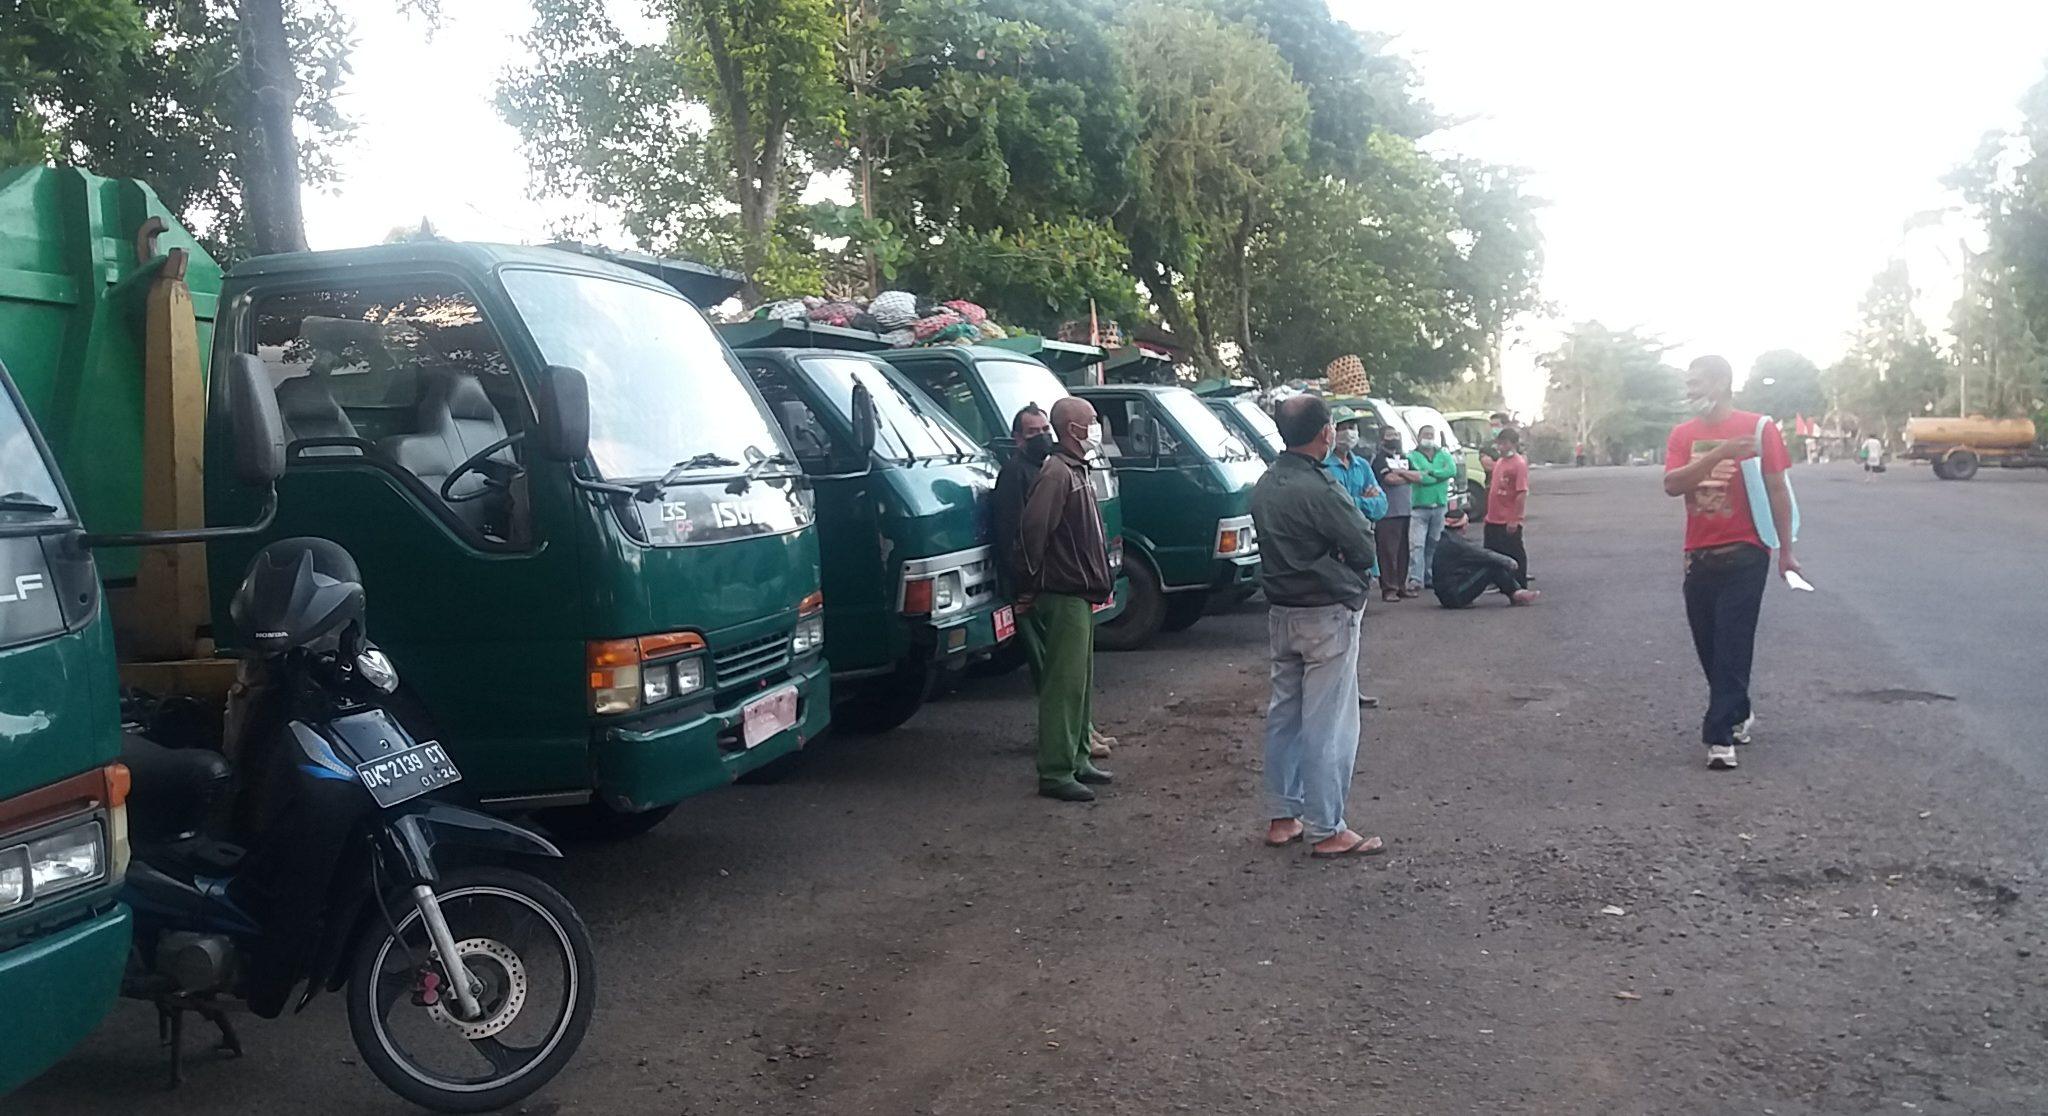 PULUHAN truk dengan muatan sampah penuh berjajar di jalan belakang Kantor DLH Tabanan, menunggu perbaikan dan pengoperasian alat berat di TPA Mandung. Foto: gap